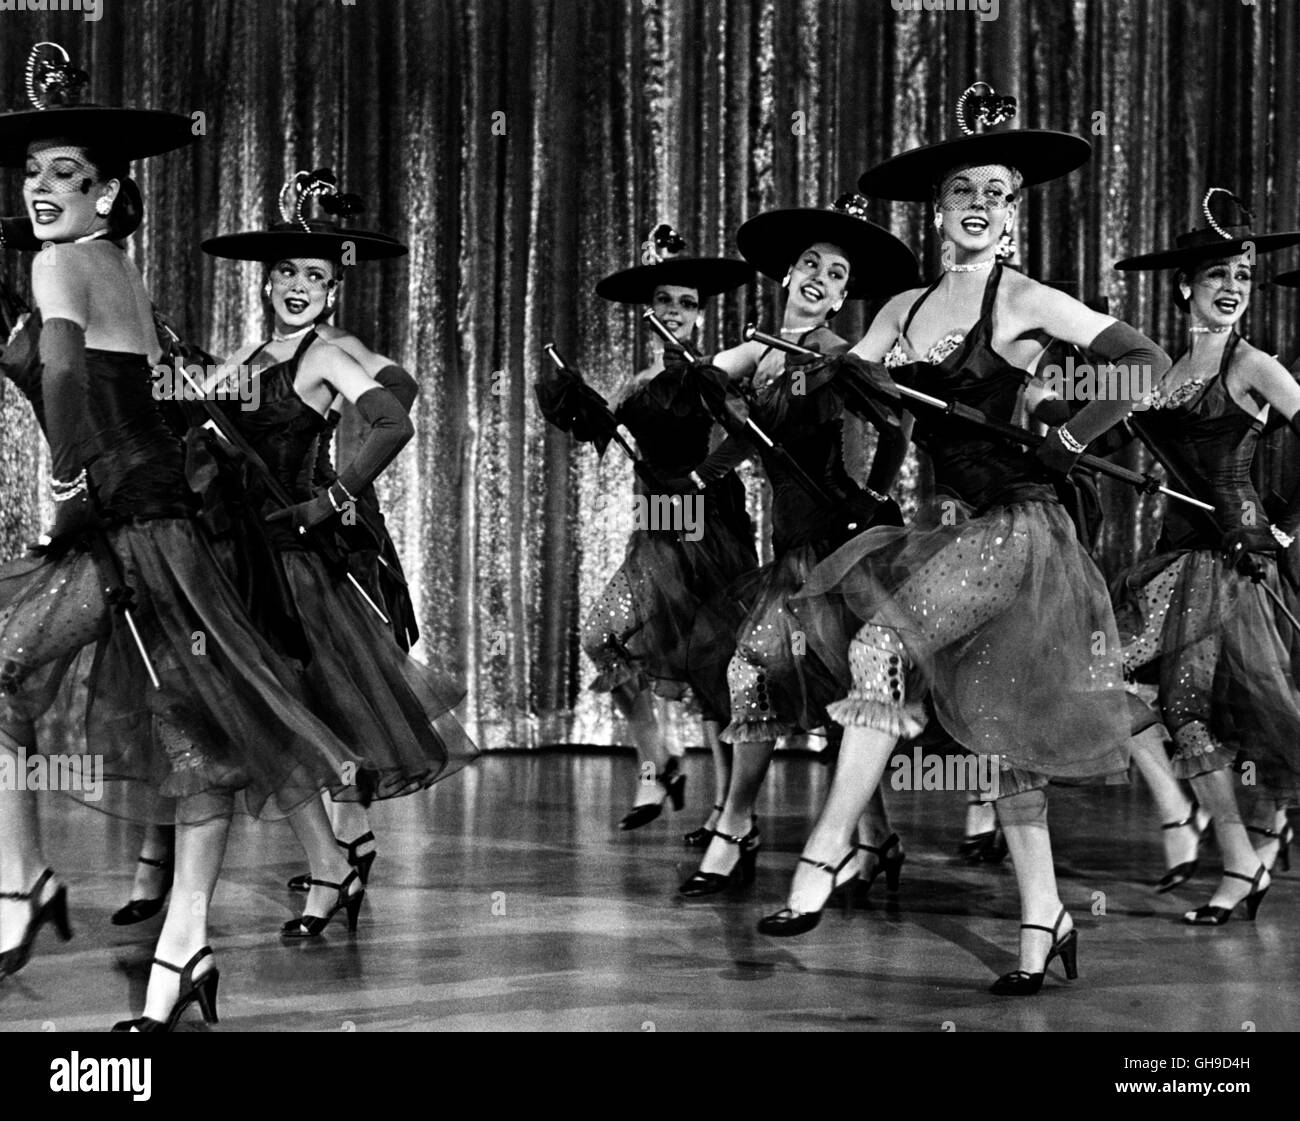 Eleanor James,Irene Cara Erotic picture Ardon Bess,Maria Frau